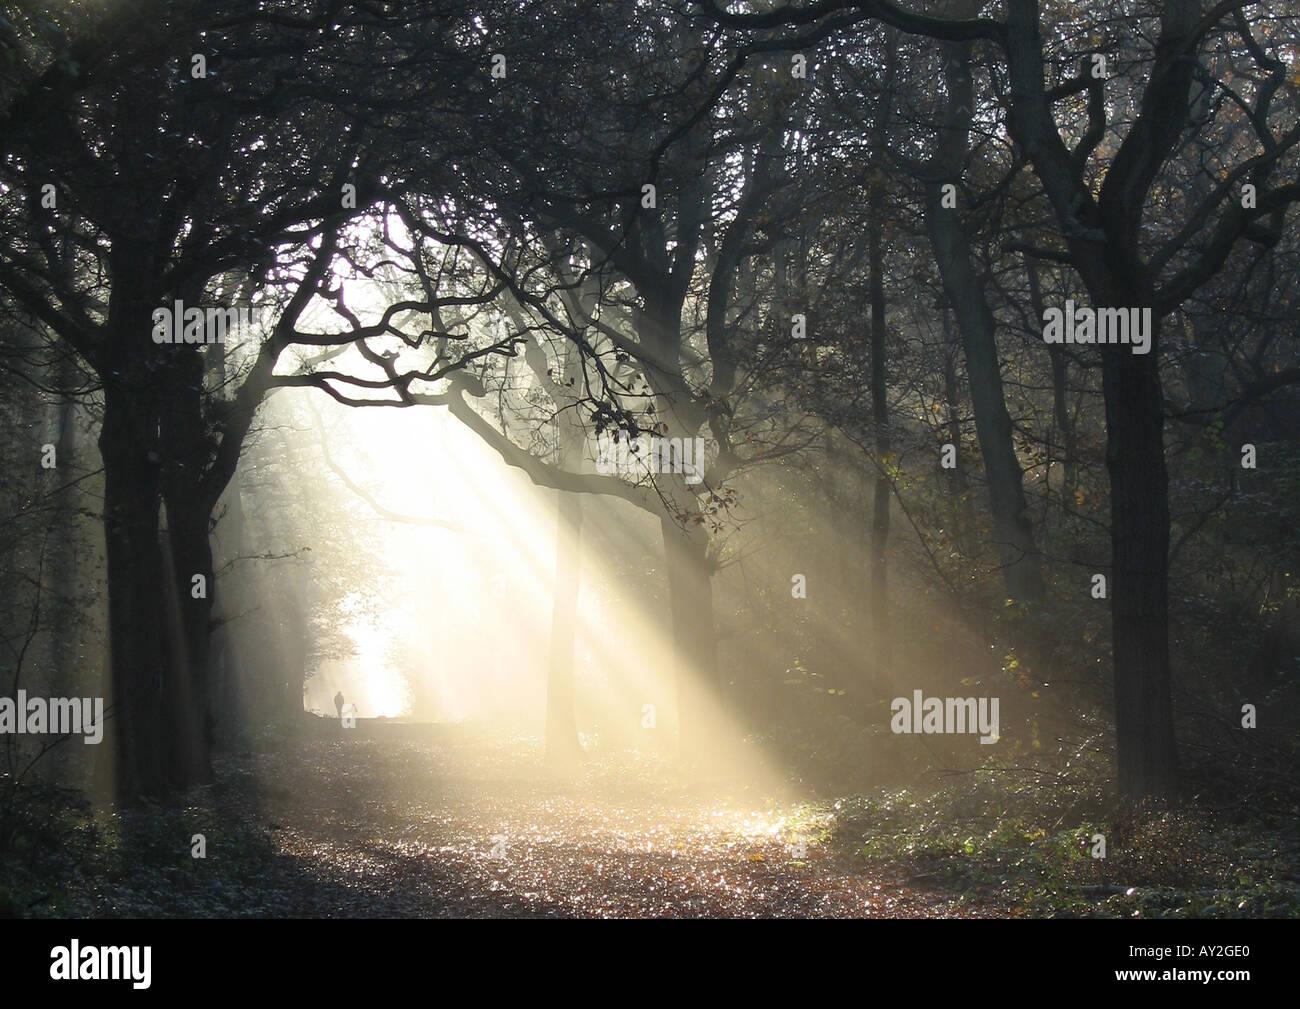 Sun shining through the trees in Kingswood Wood, Sanderstead, Surrey - 1 - Stock Image